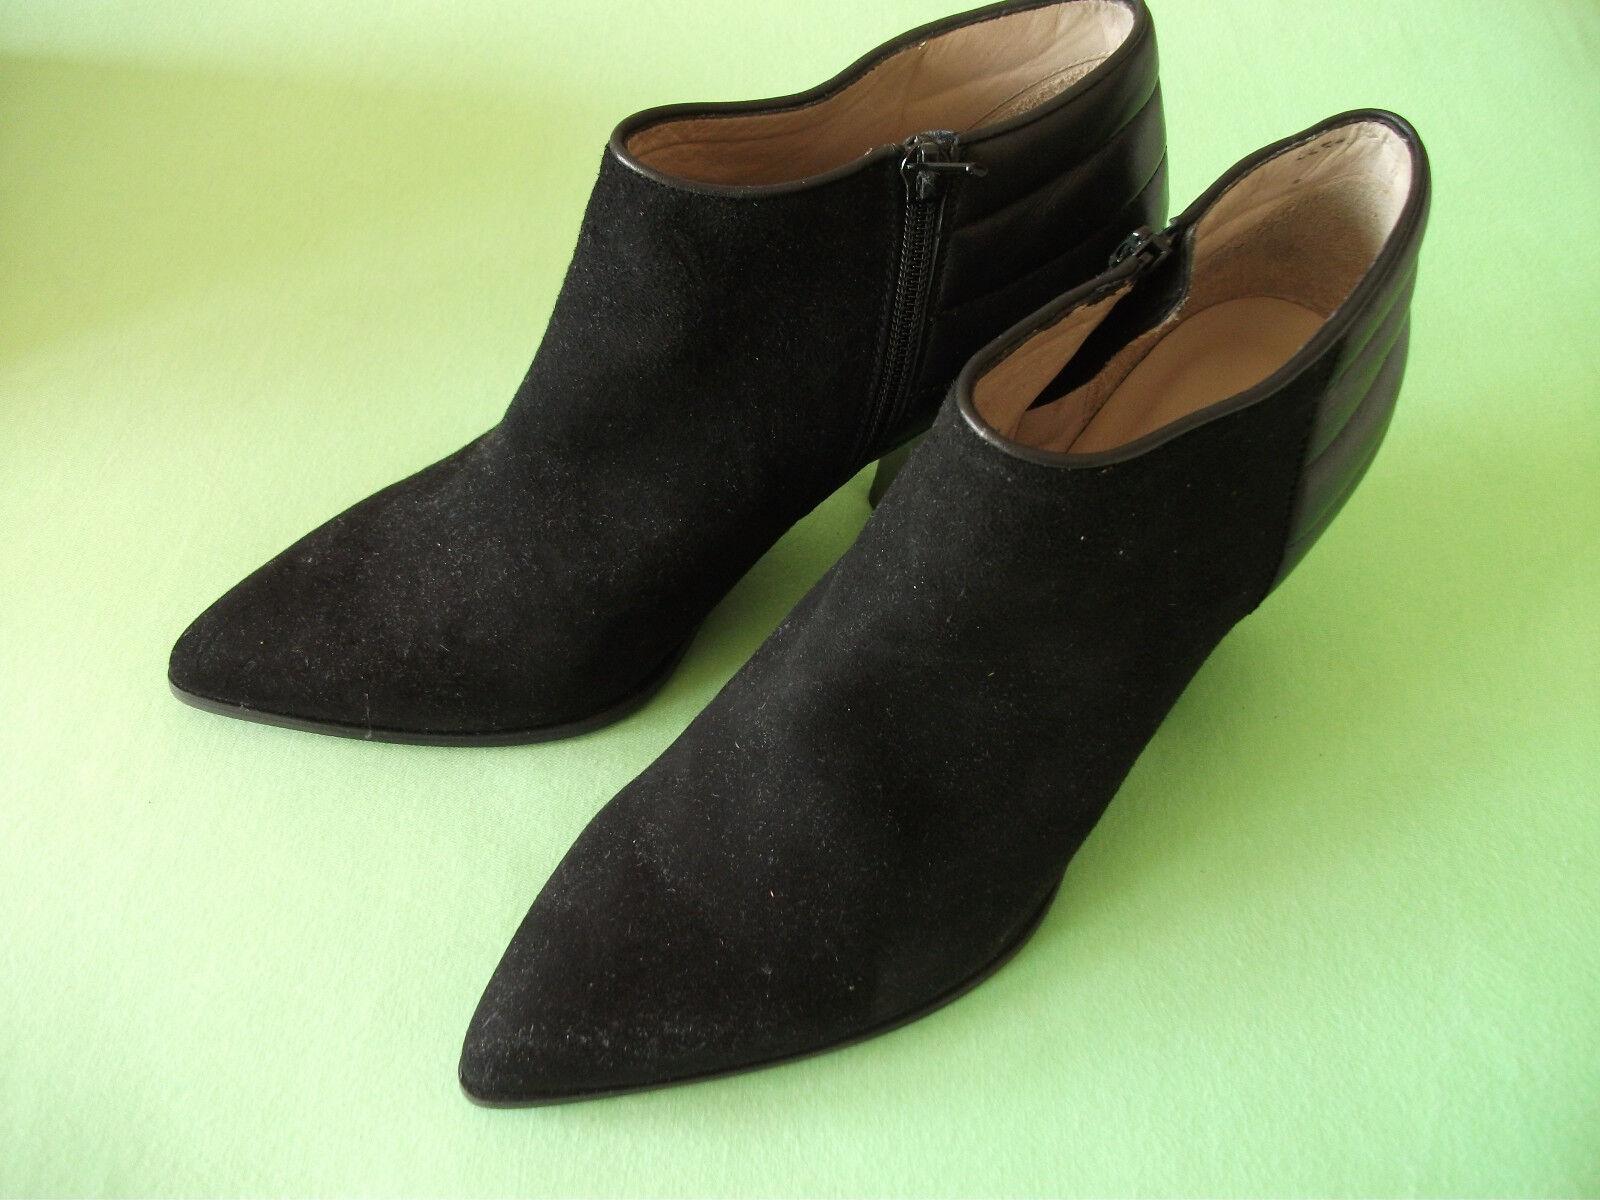 Orig. UNISA- moderne Echtleder- Stiefelette schwarz Gr. 40 neu